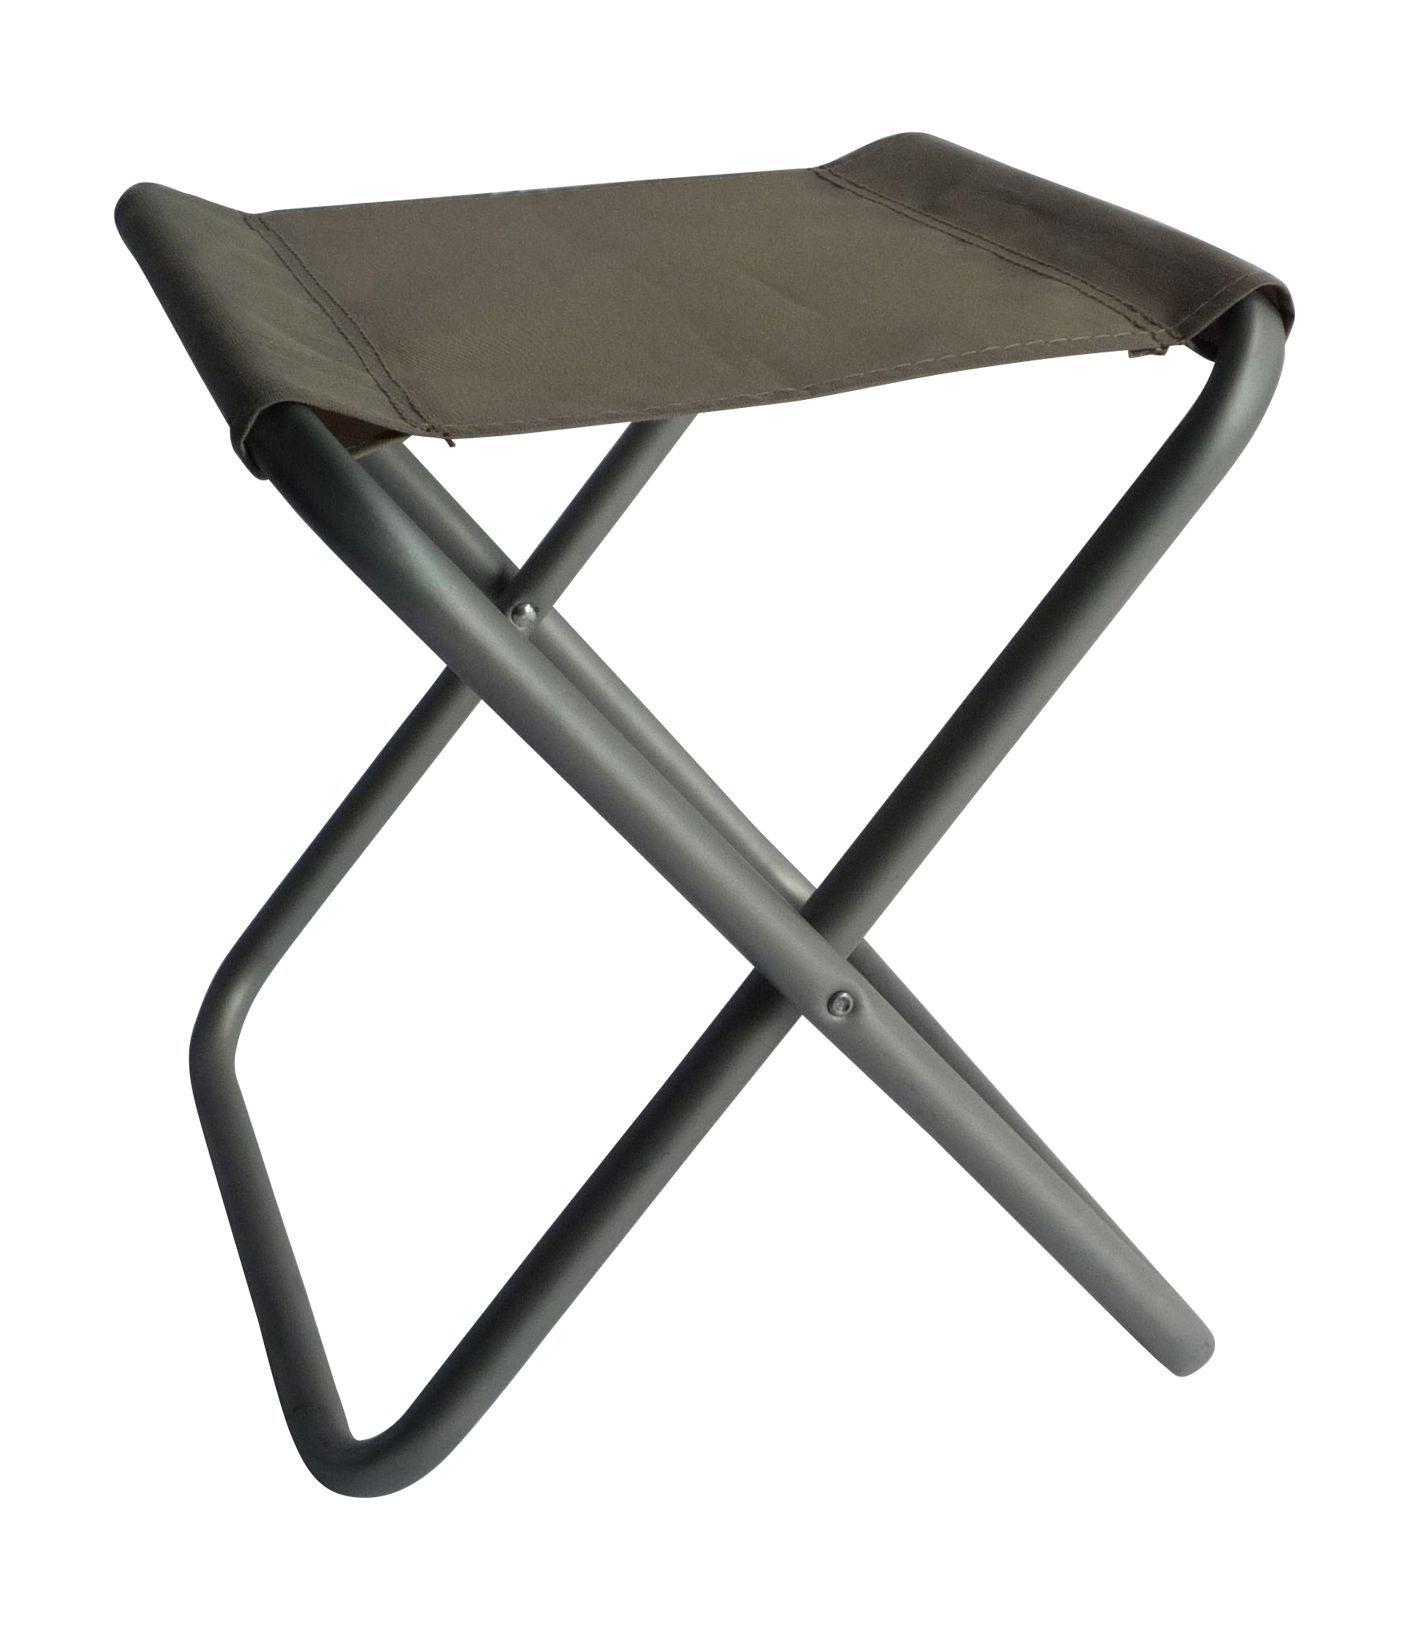 Folding Aluminum Camp Stool Chairish : 83afec95 6177 4225 a4c8 49ebb7a46eafaspectfitampwidth640ampheight640 from www.chairish.com size 640 x 640 jpeg 24kB